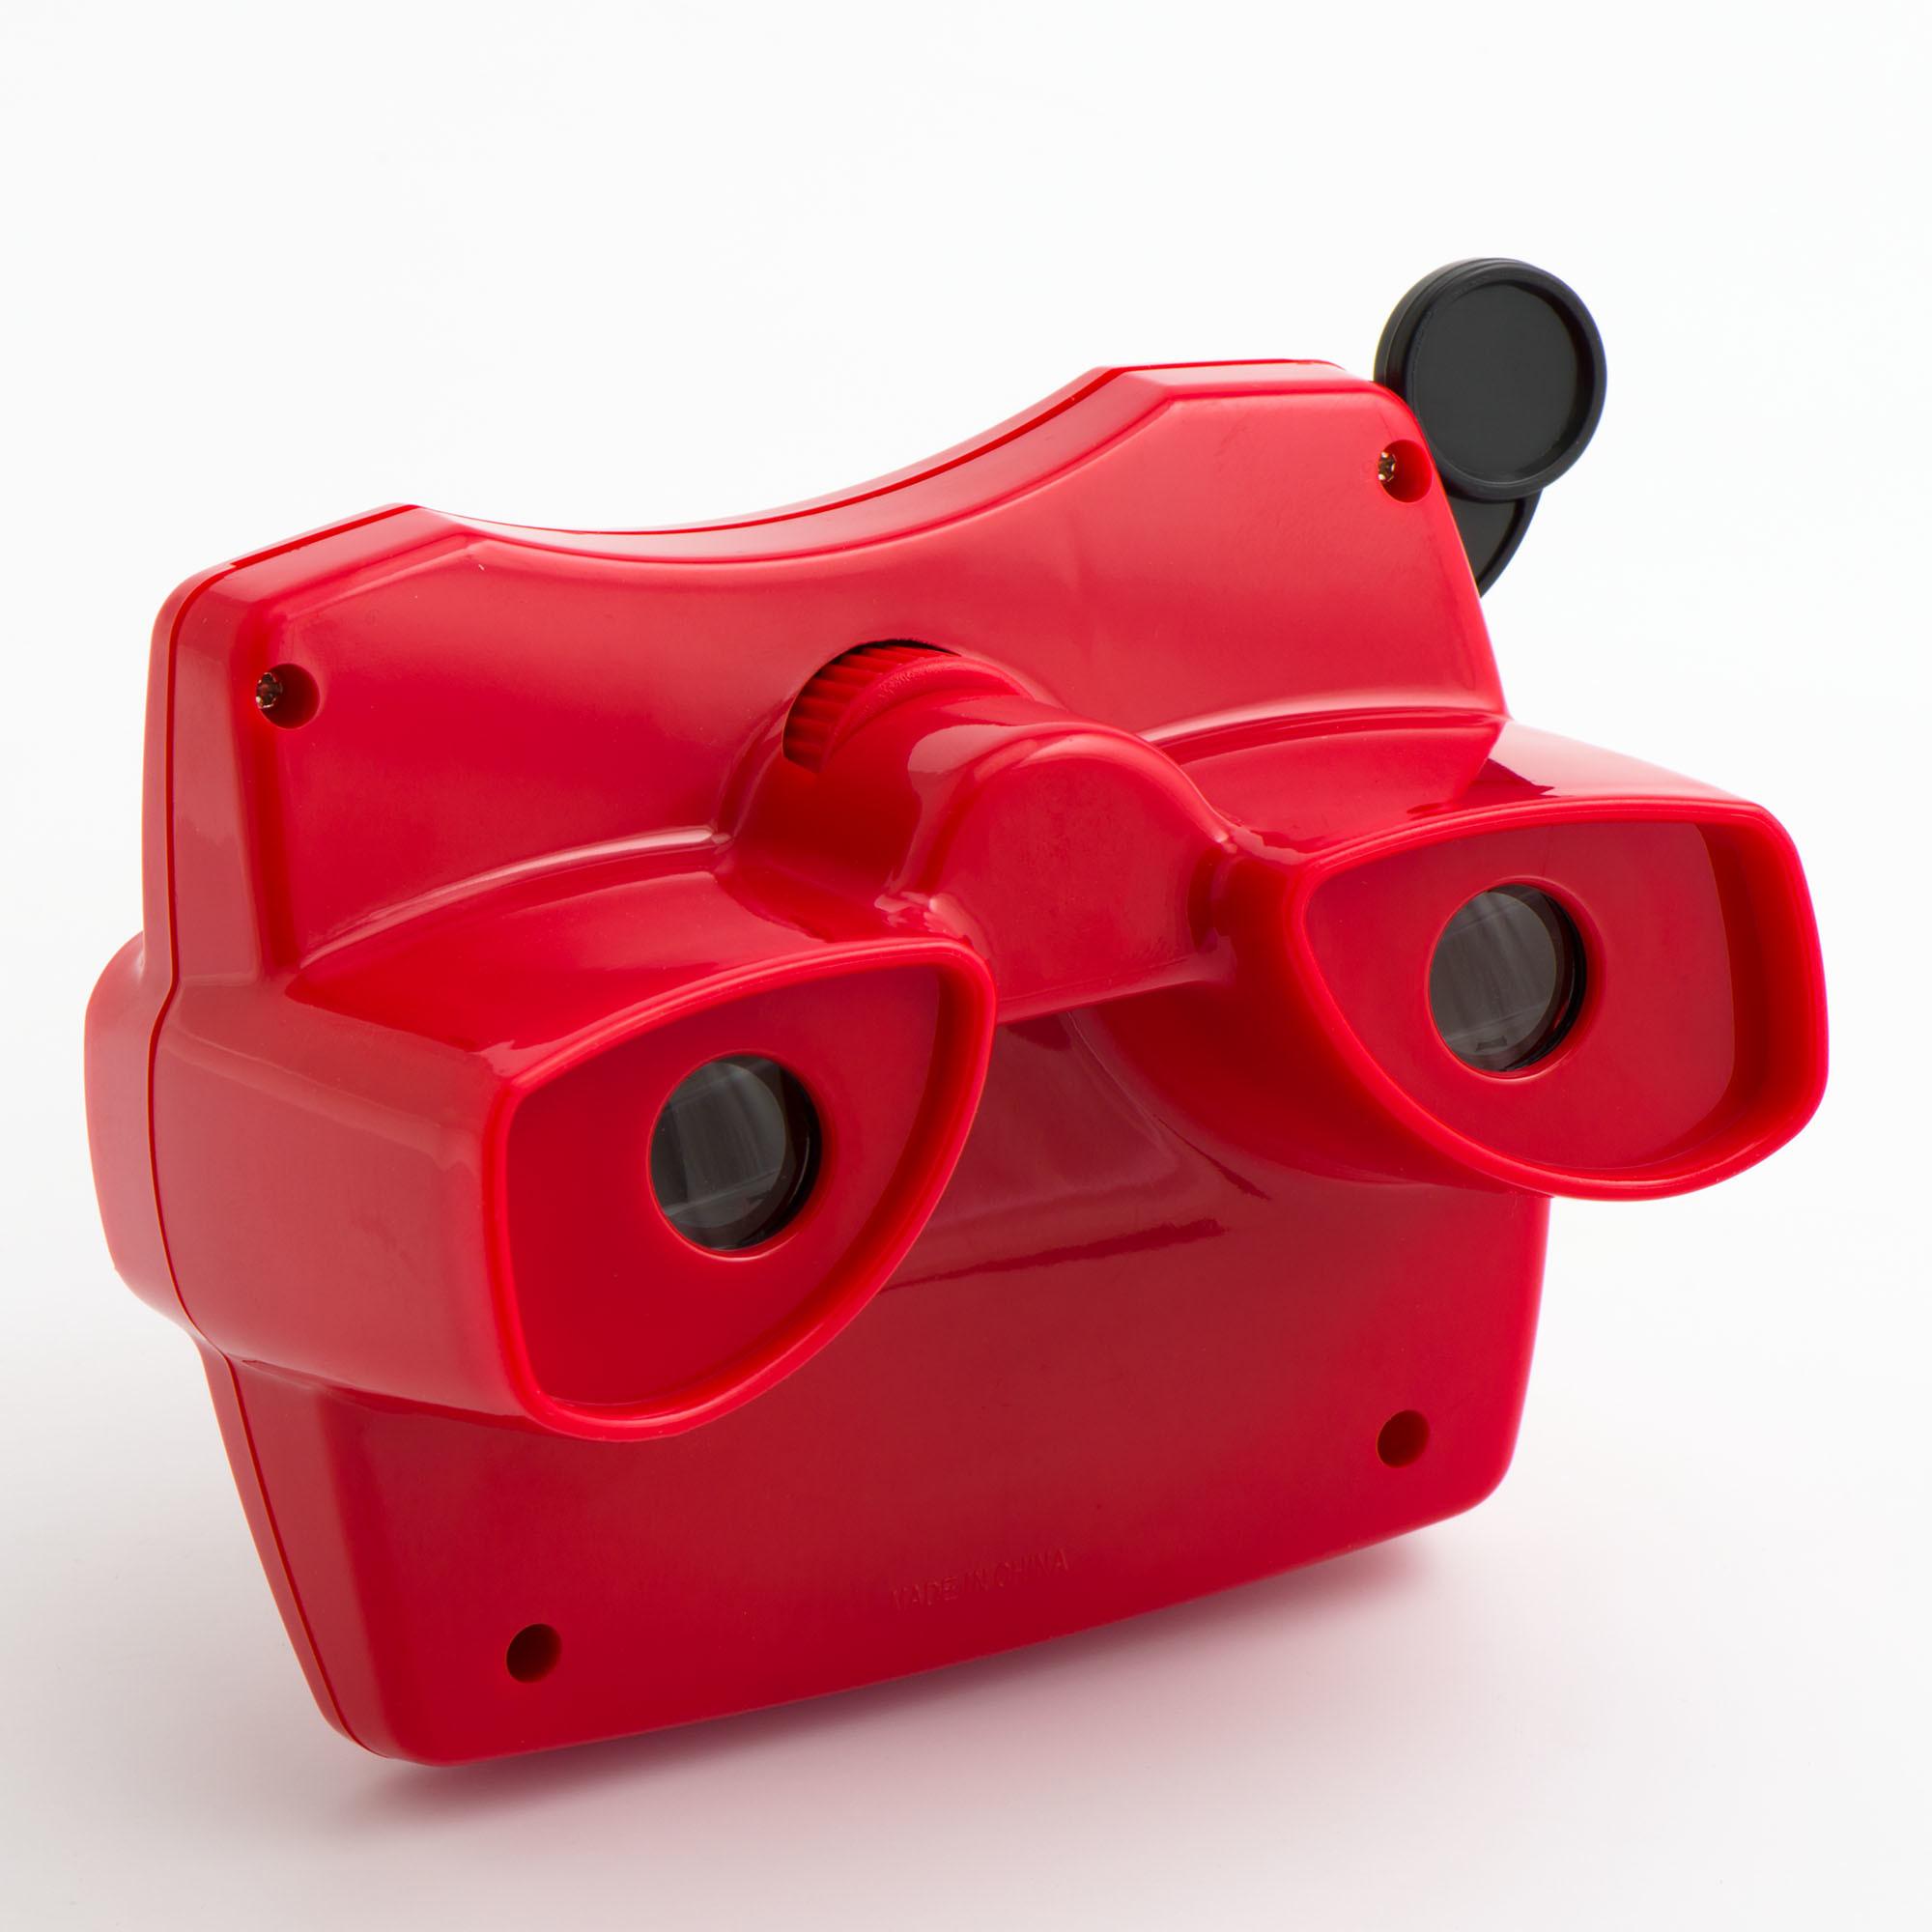 Retro View-Master reel viewer